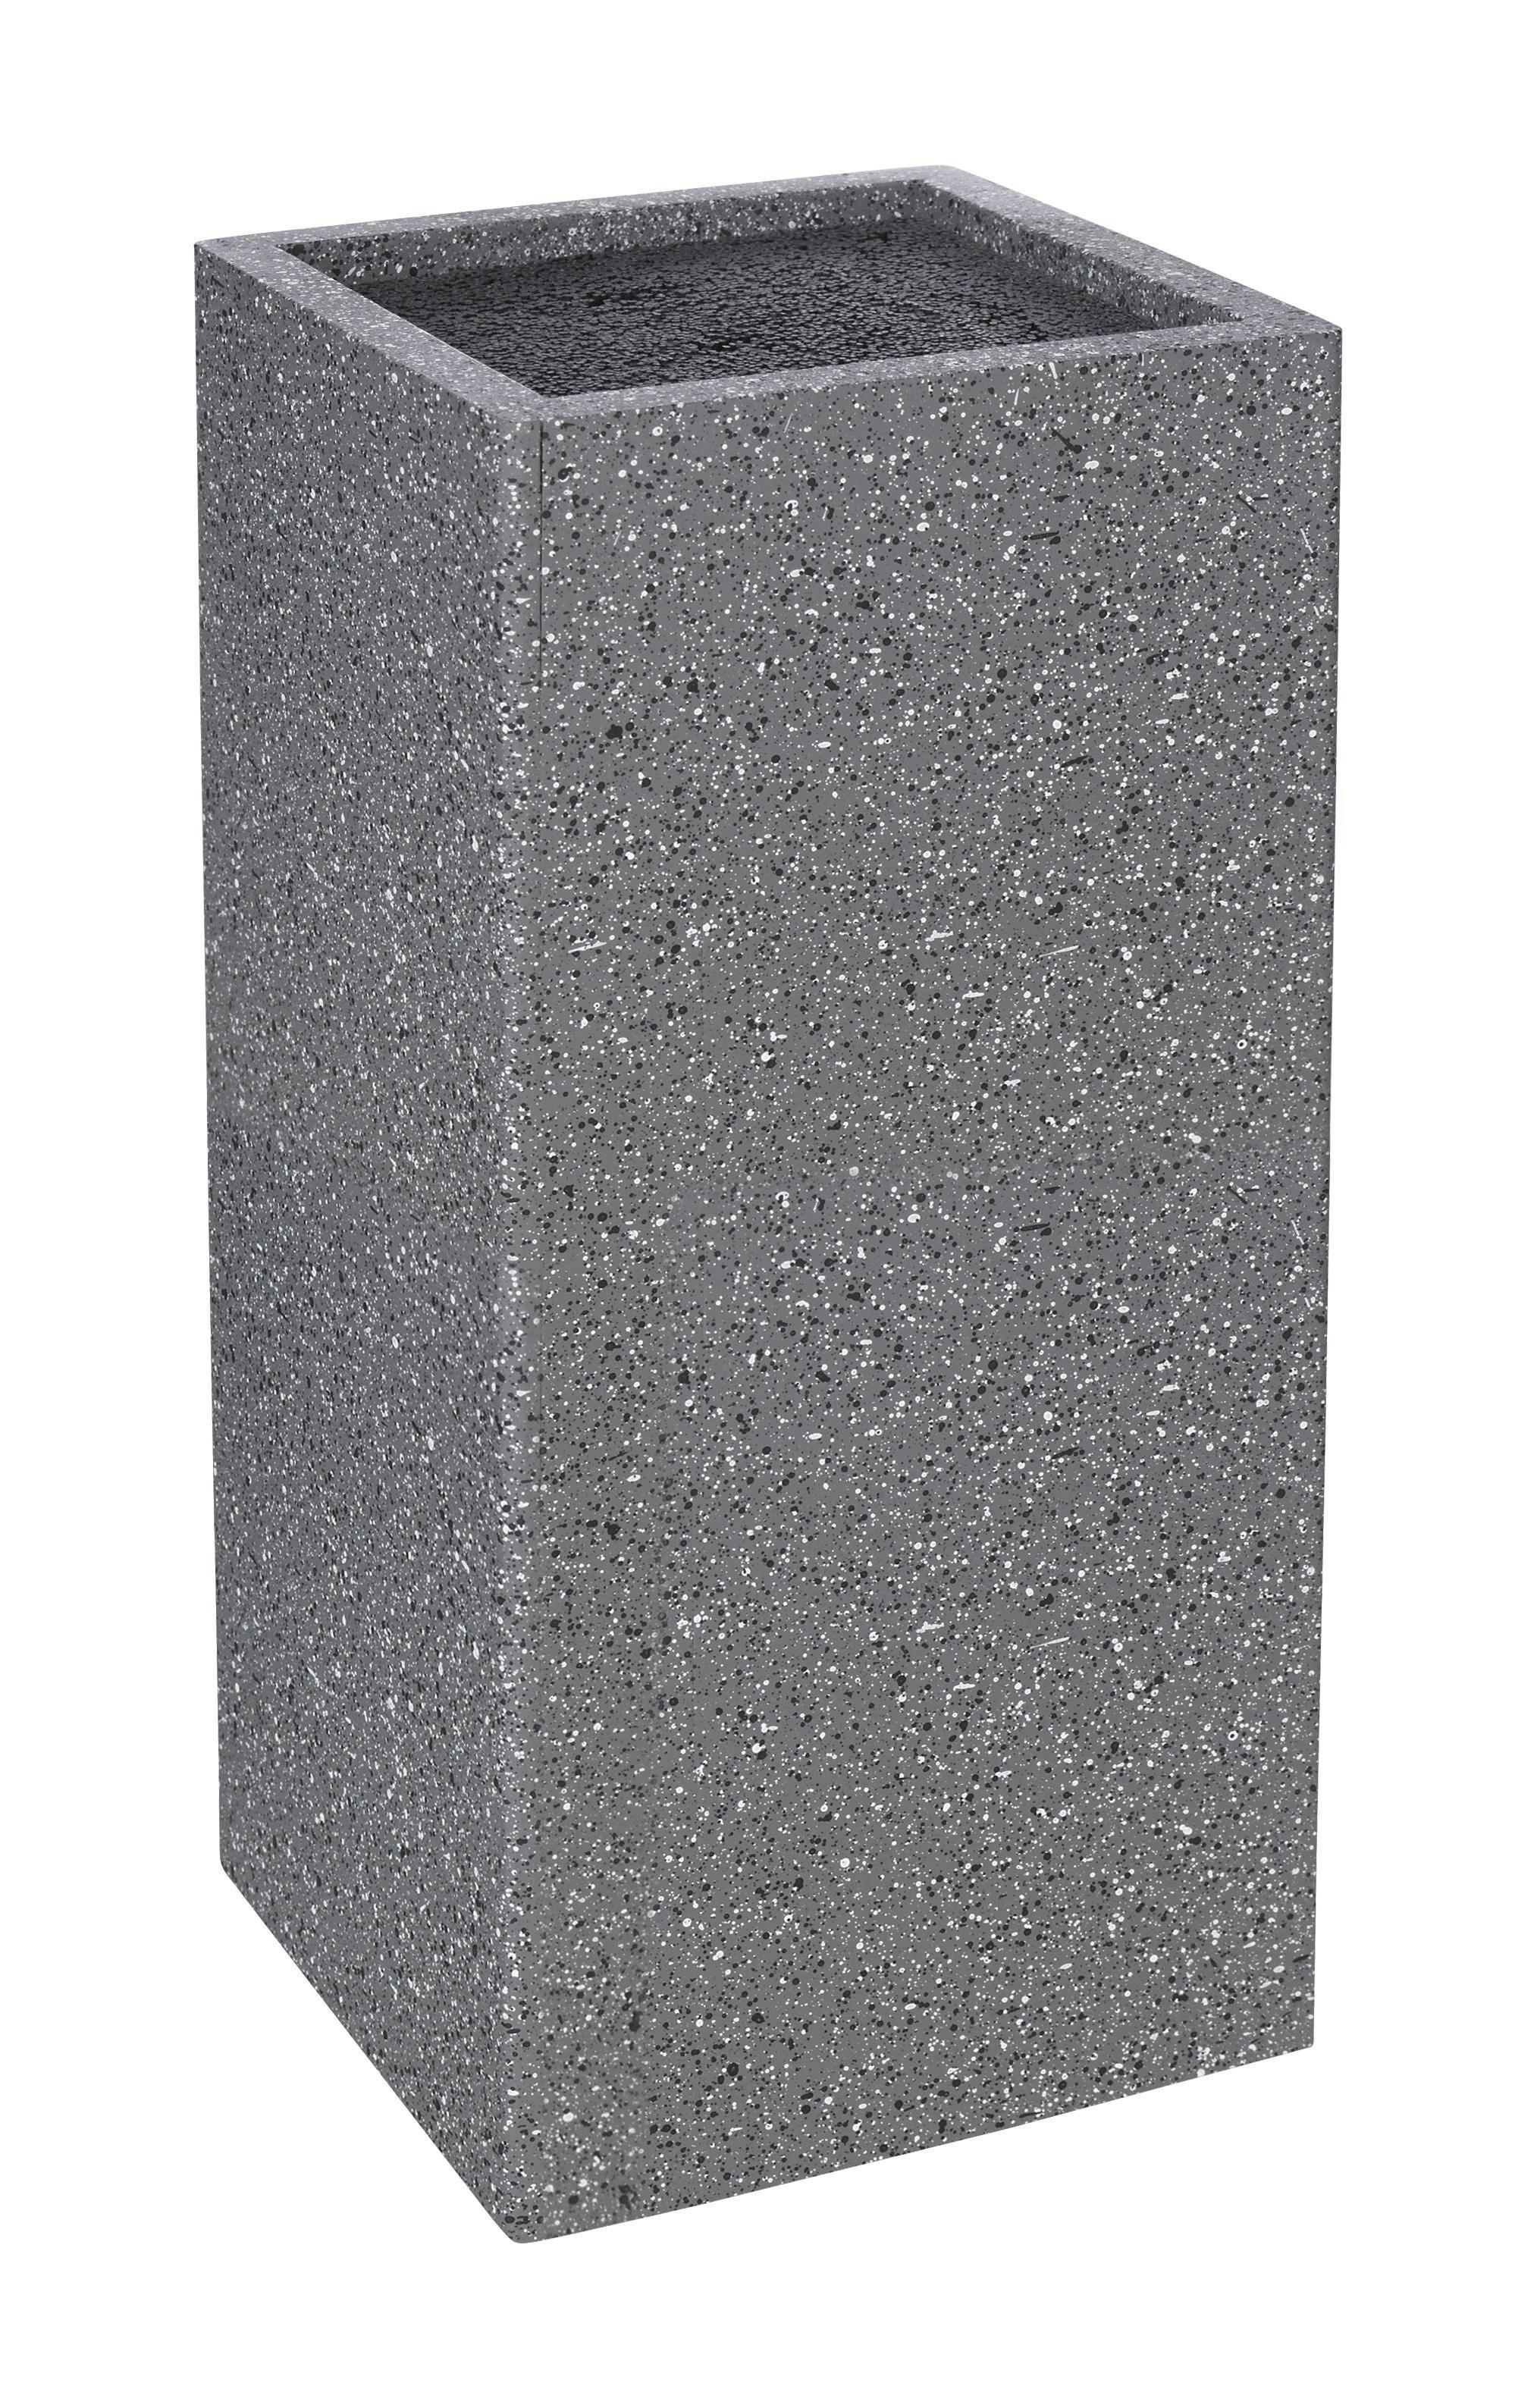 Késtartó Blokk Simon - multicolor/szürke, modern, műanyag/faanyagok (11/10,6/24cm) - MÖMAX modern living